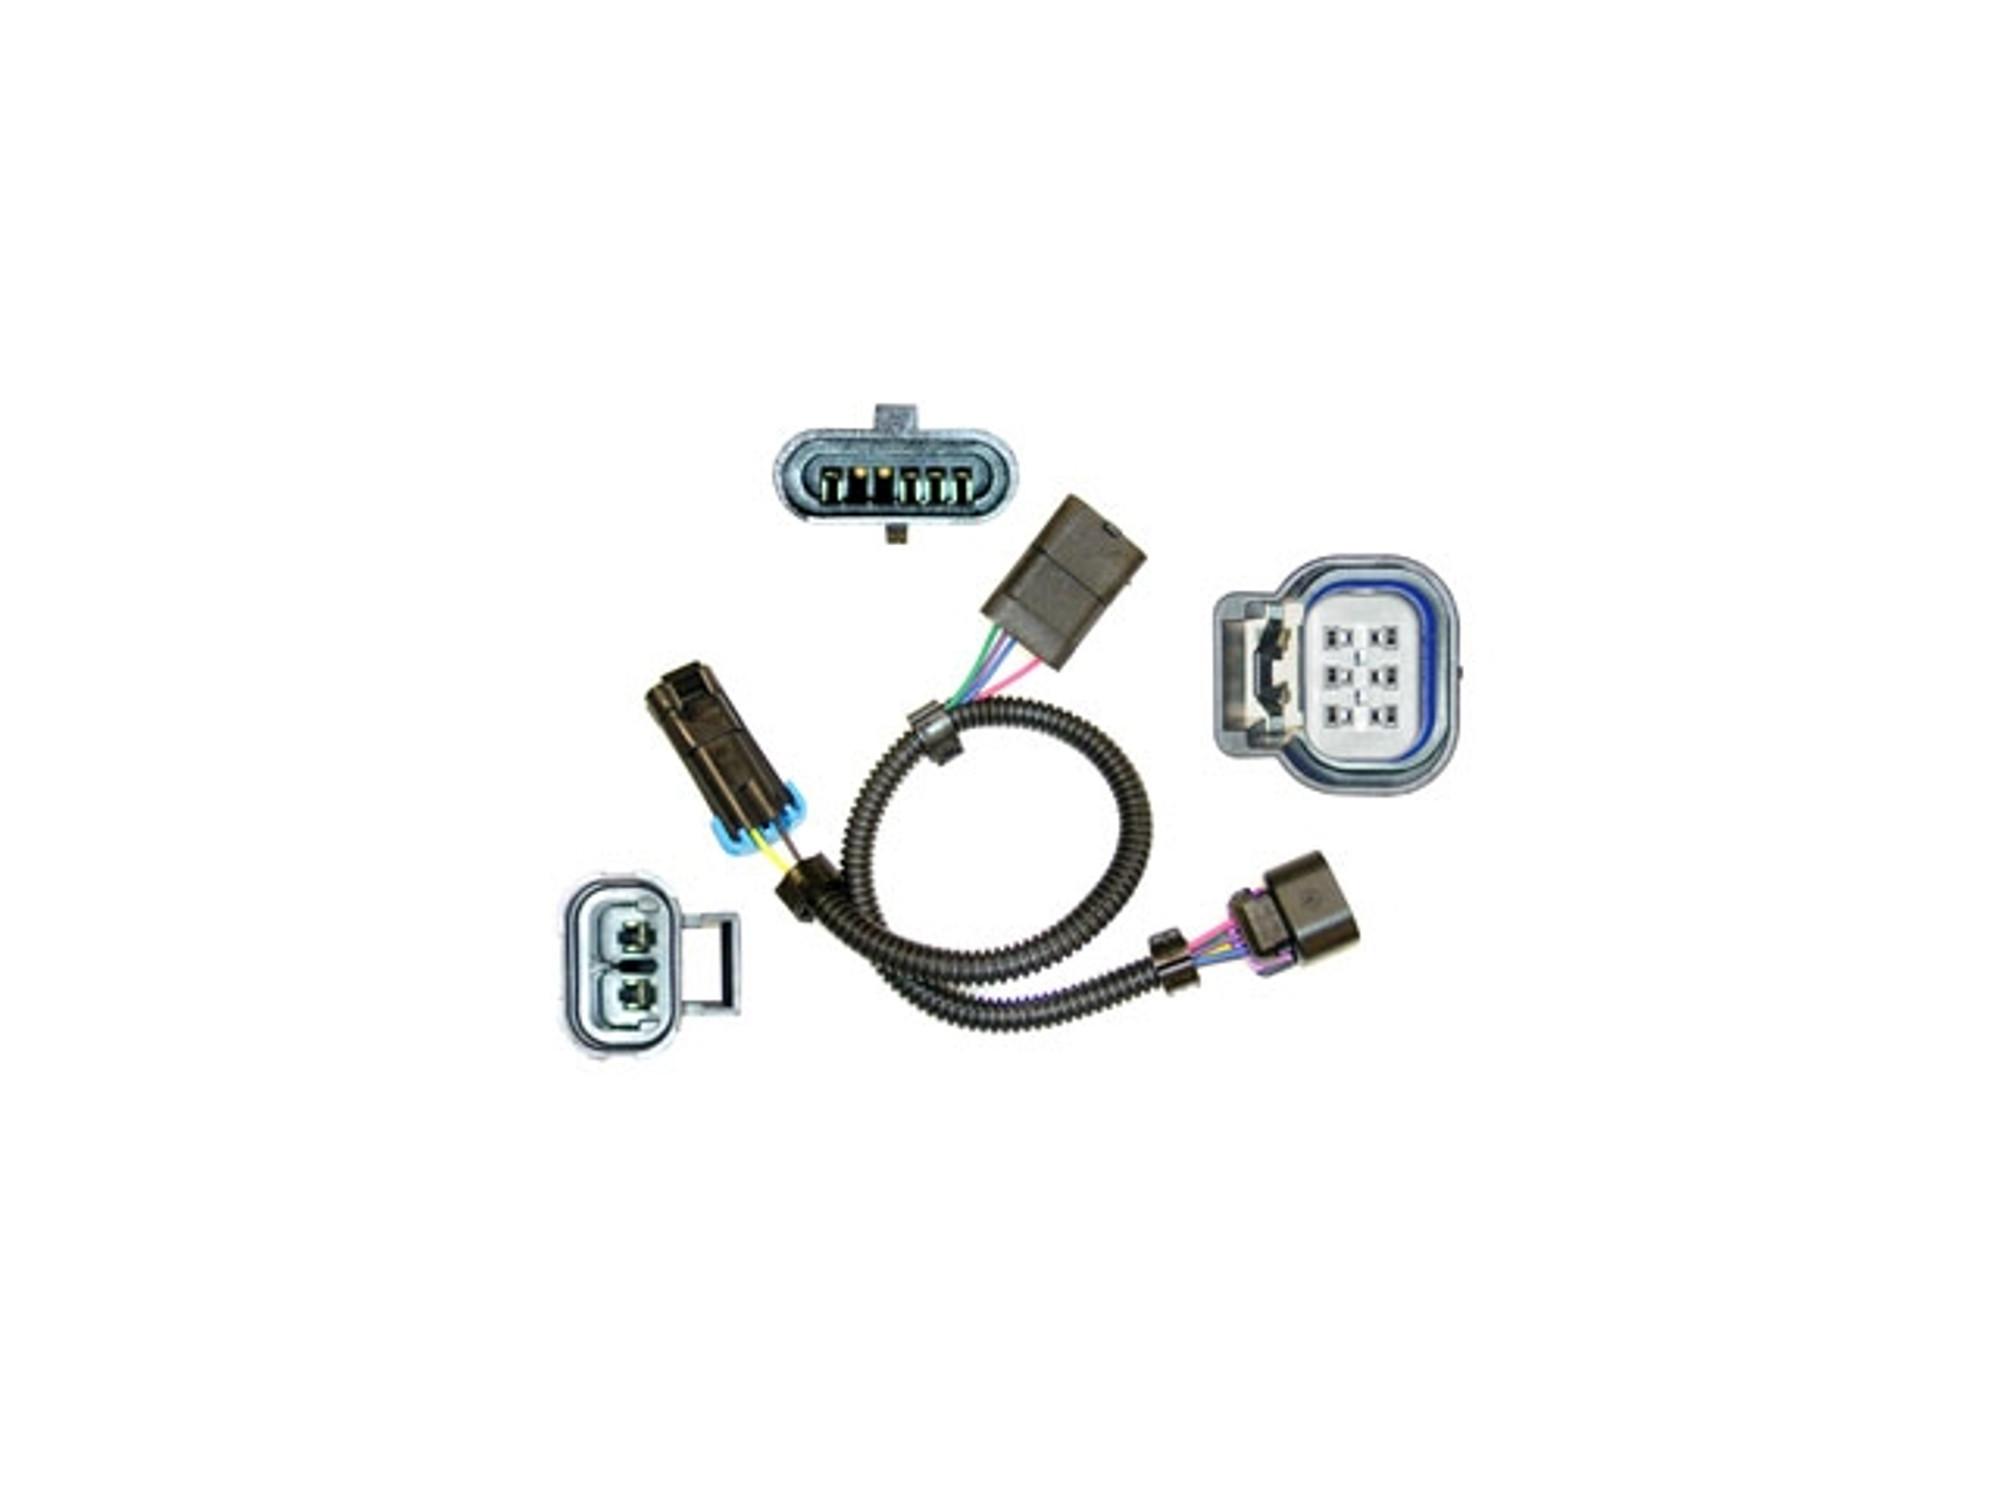 casper u0026 39 s throttle body adapter harness ls2 to ls1